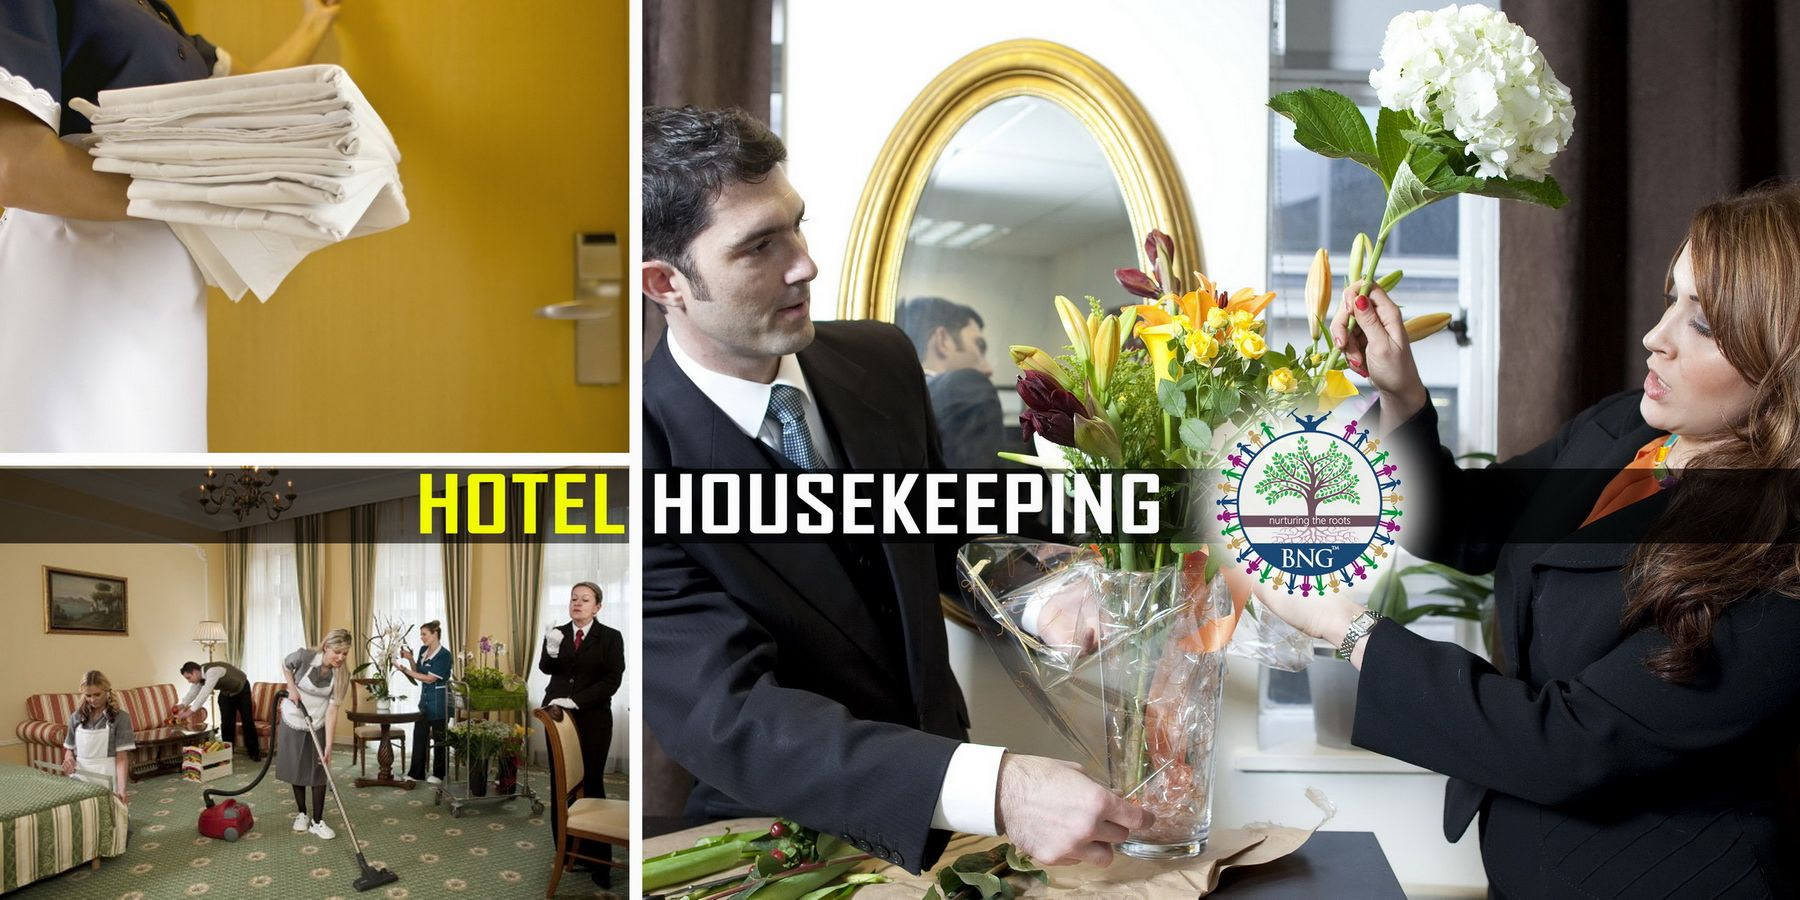 Hotel housekeeping hotel housekeeping hotel